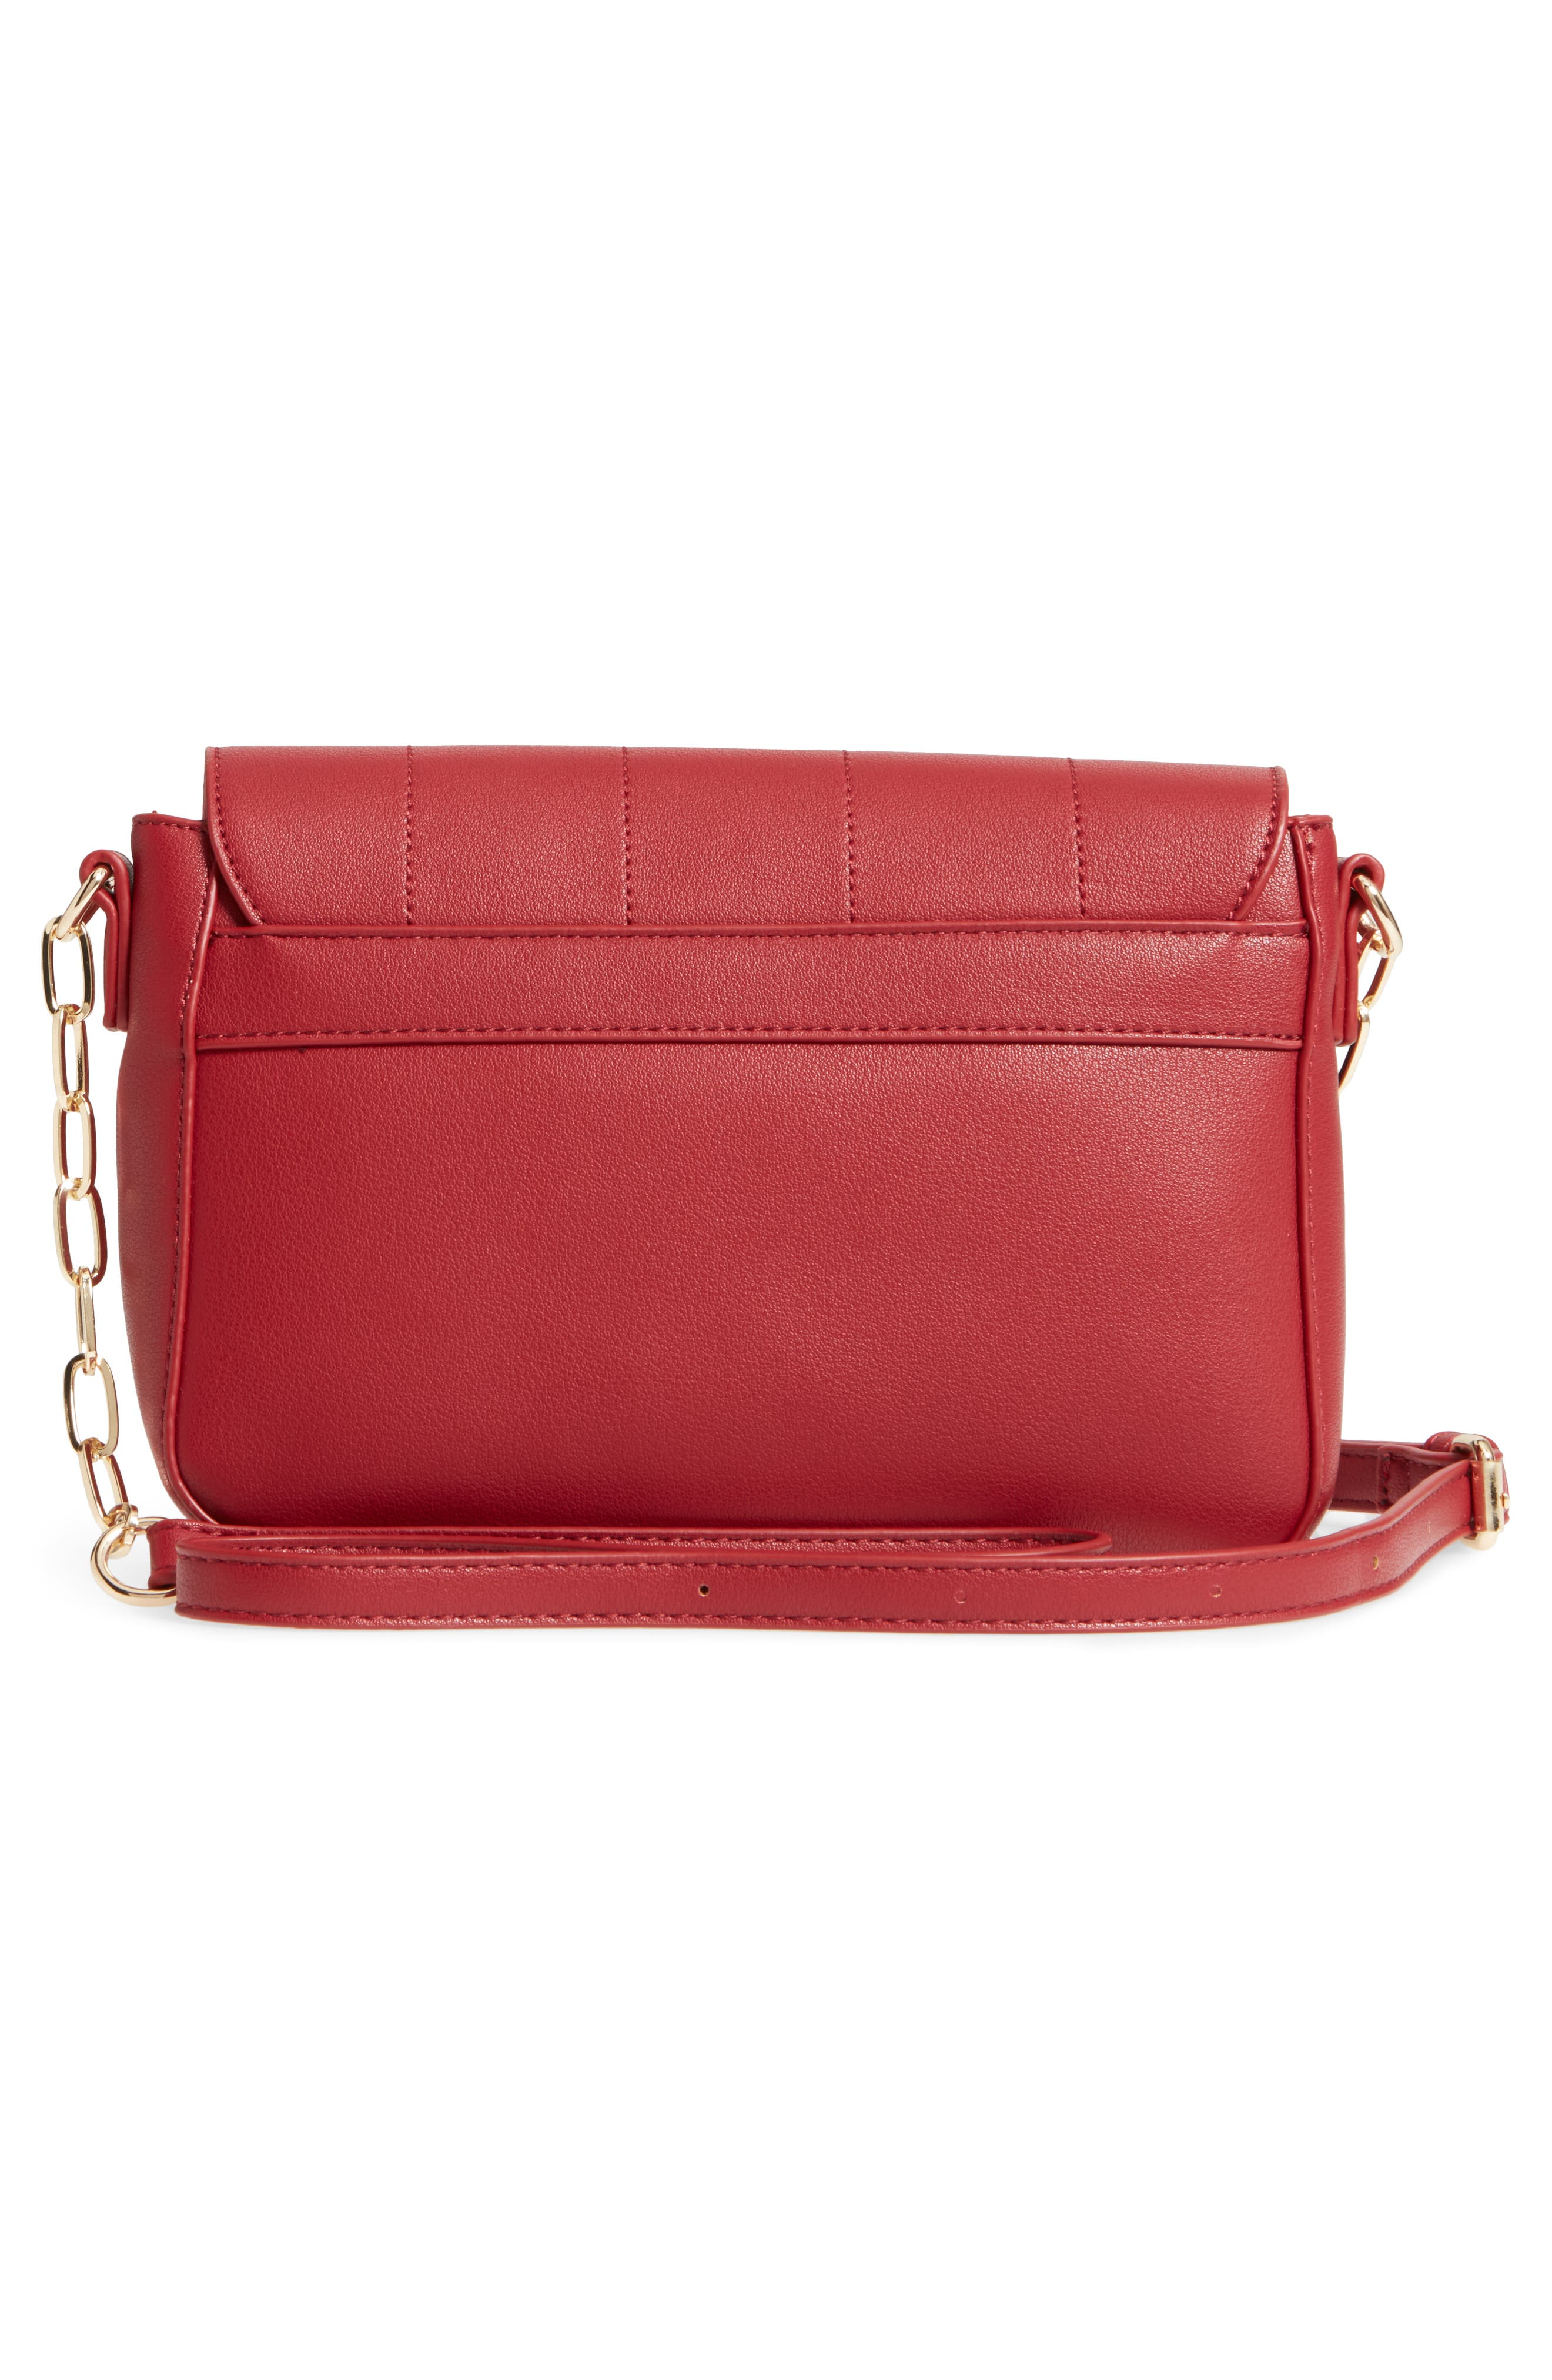 Colie Faux Leather Crossbody Bag,                             Alternate thumbnail 9, color,